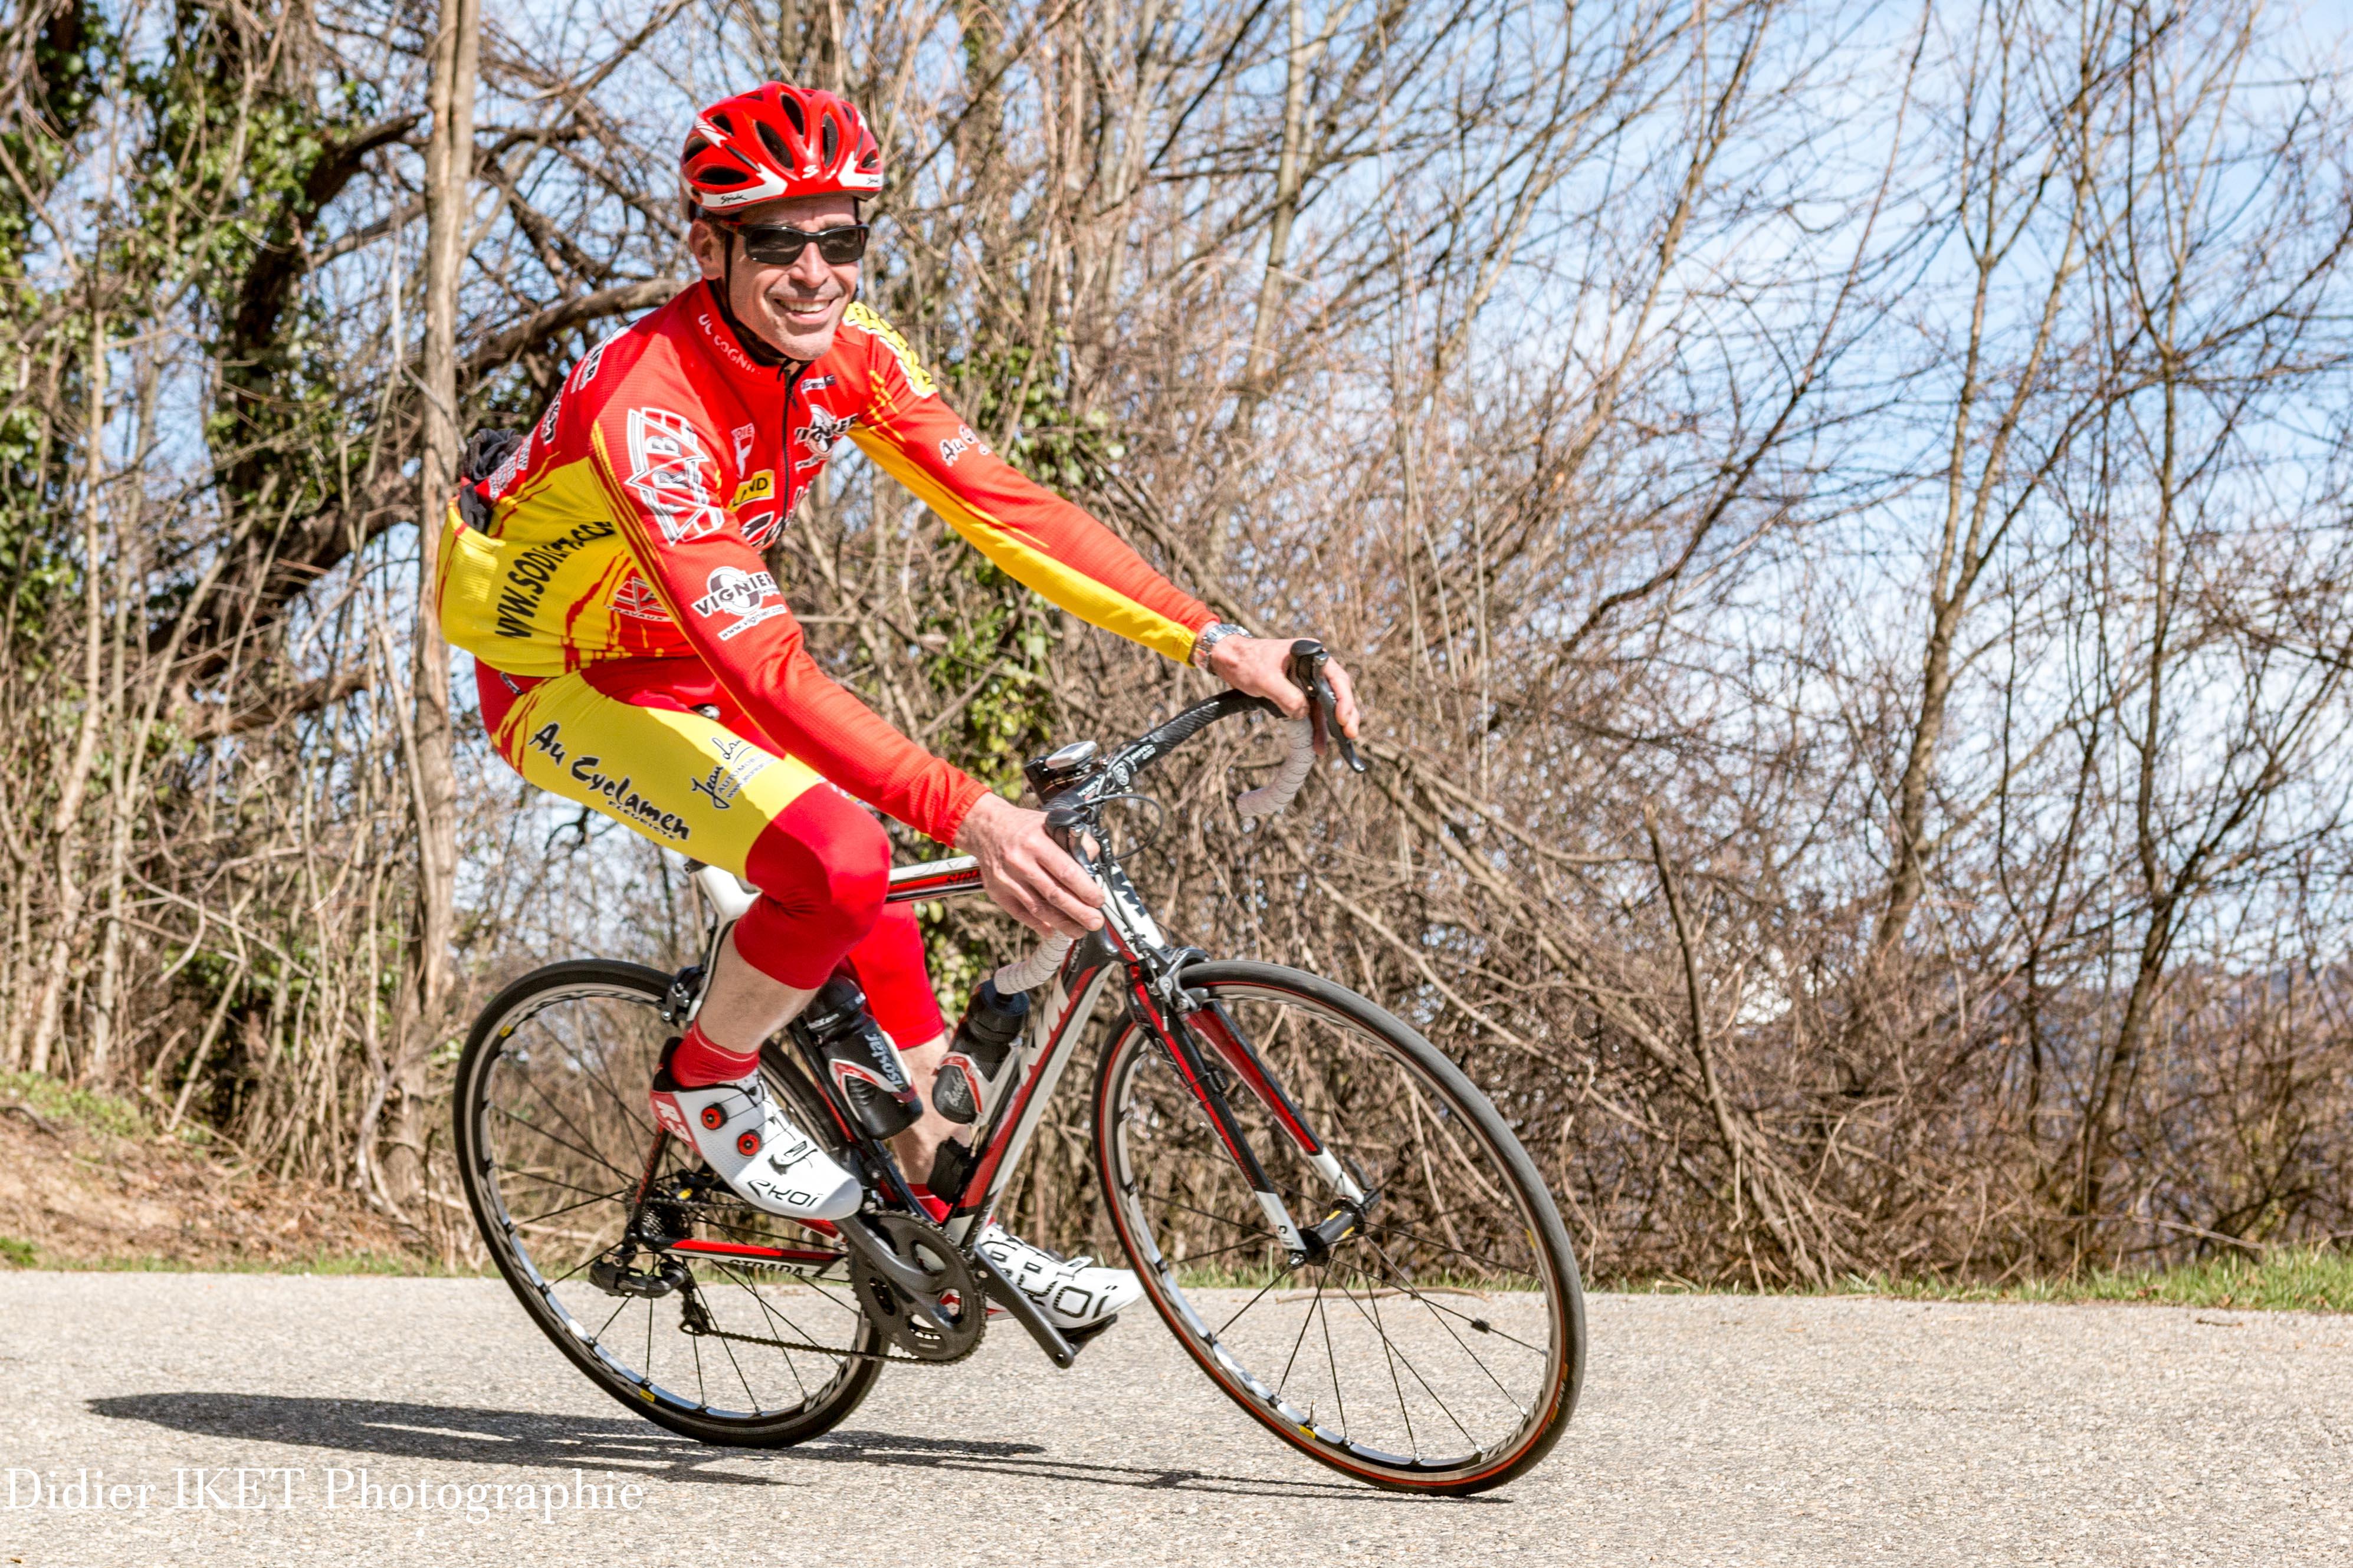 Calendrier Fsgt Cyclisme 2019.Cyclisme Fsgt73